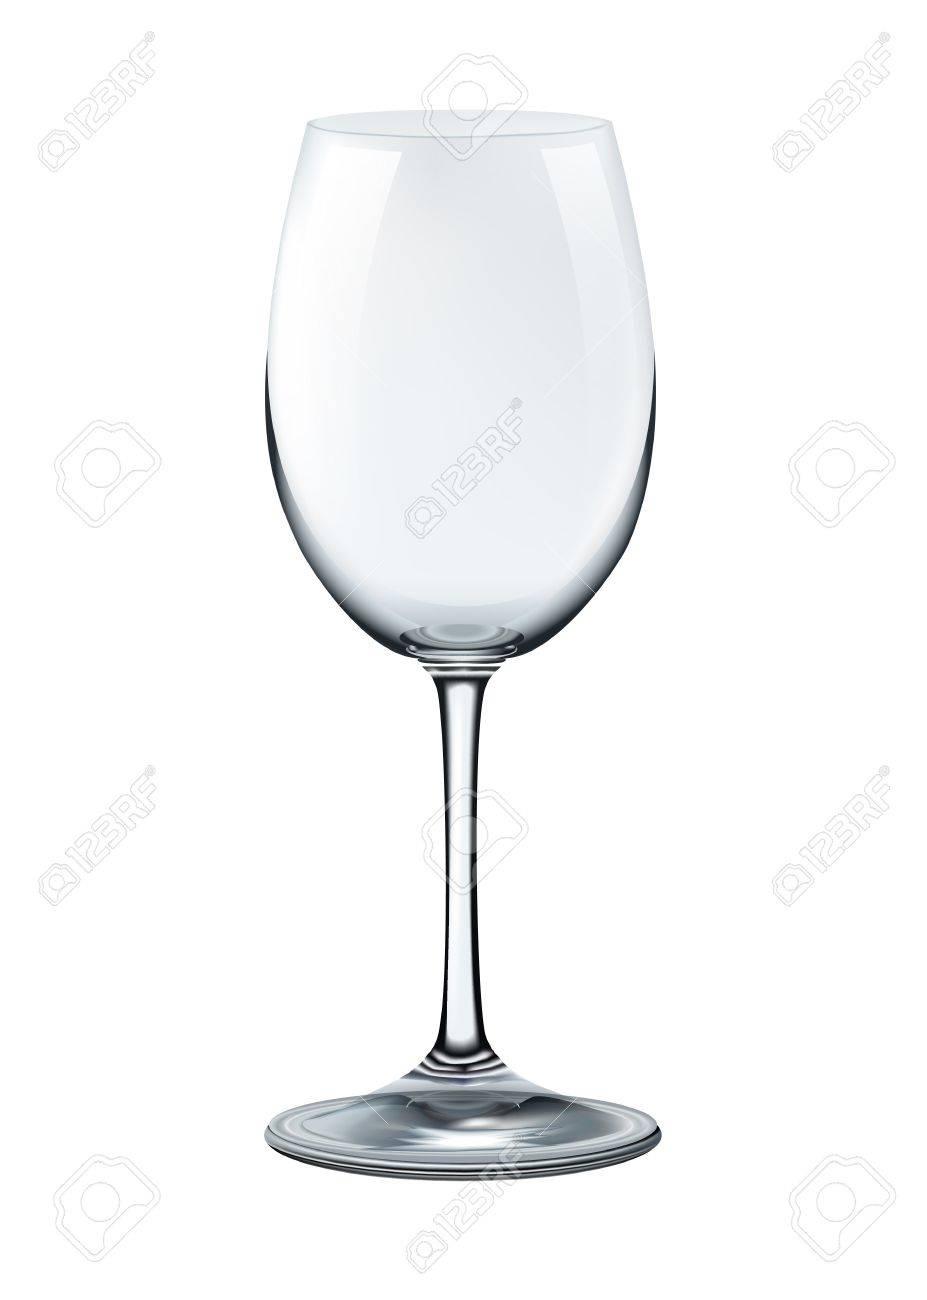 photorealistic empty wine glass isolated illustration.